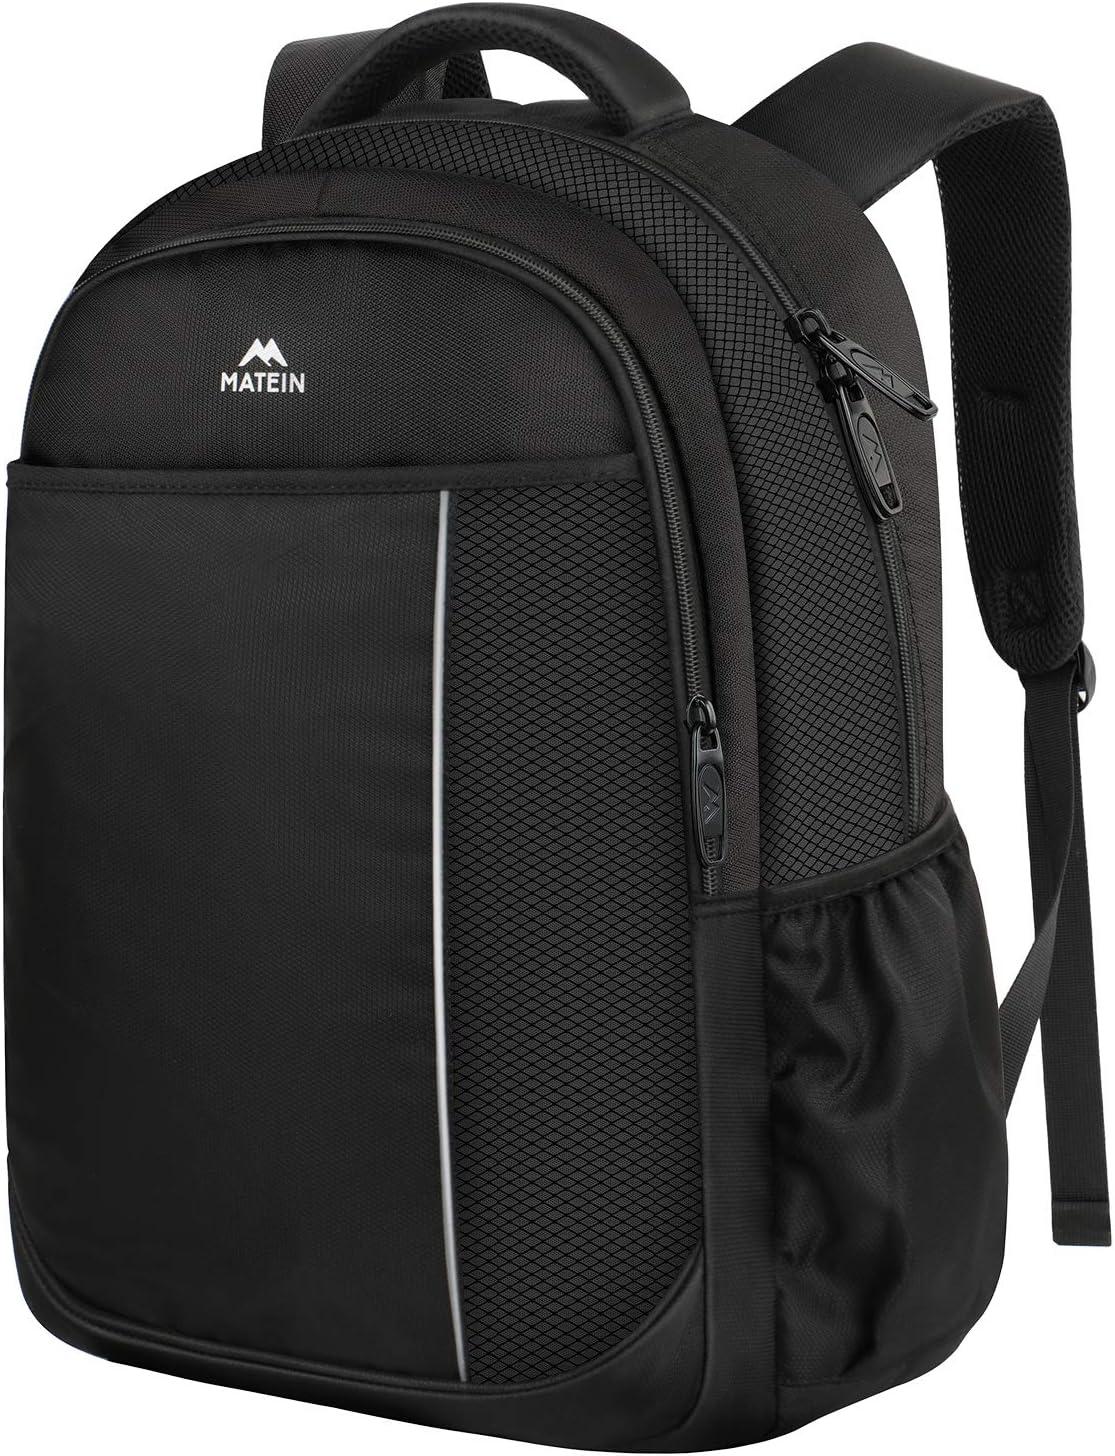 College Student Bookbag, Middle School Backpack Laptop Bag for Men Women Teens, Lightweight Water-Resistant School Computer Bag Fits 15.6 inch Laptop, Slim Daypacks for Boys Girls Black